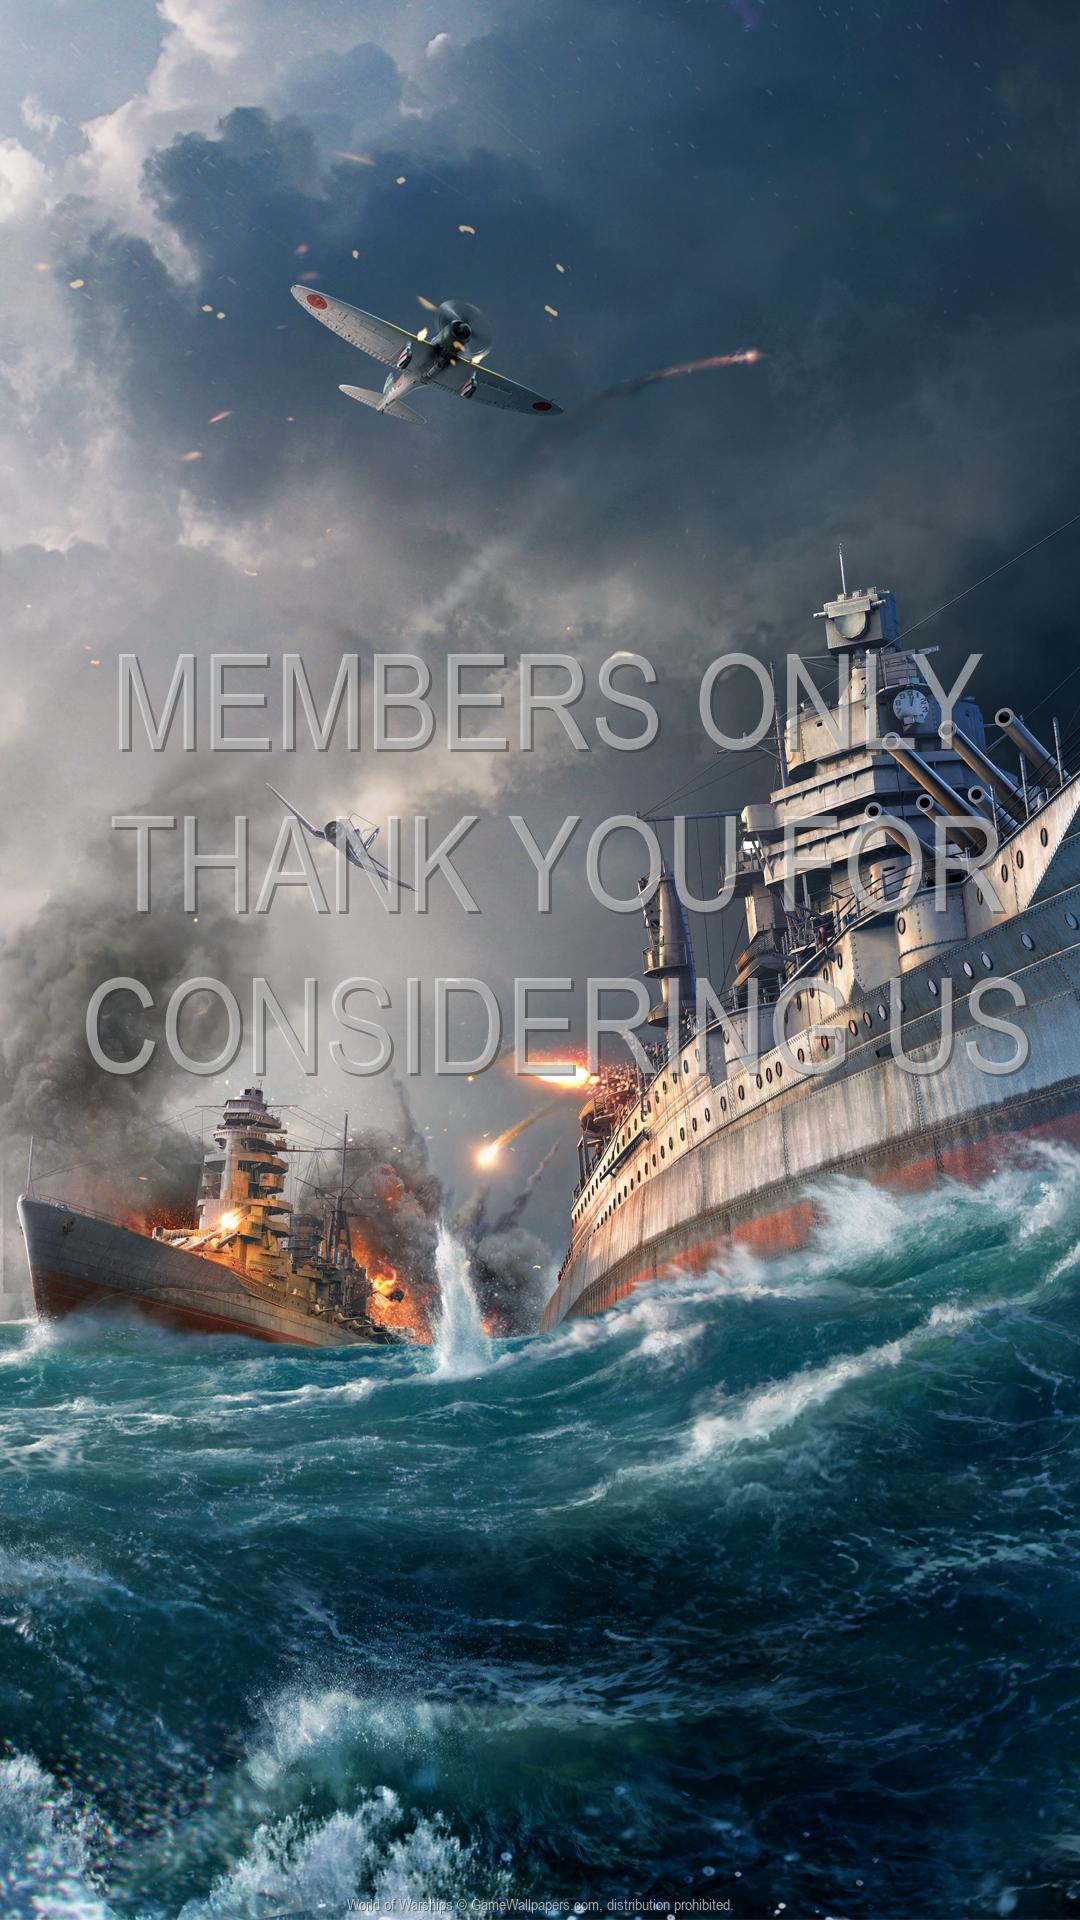 World of Warships 1920x1080 Handy Hintergrundbild 05